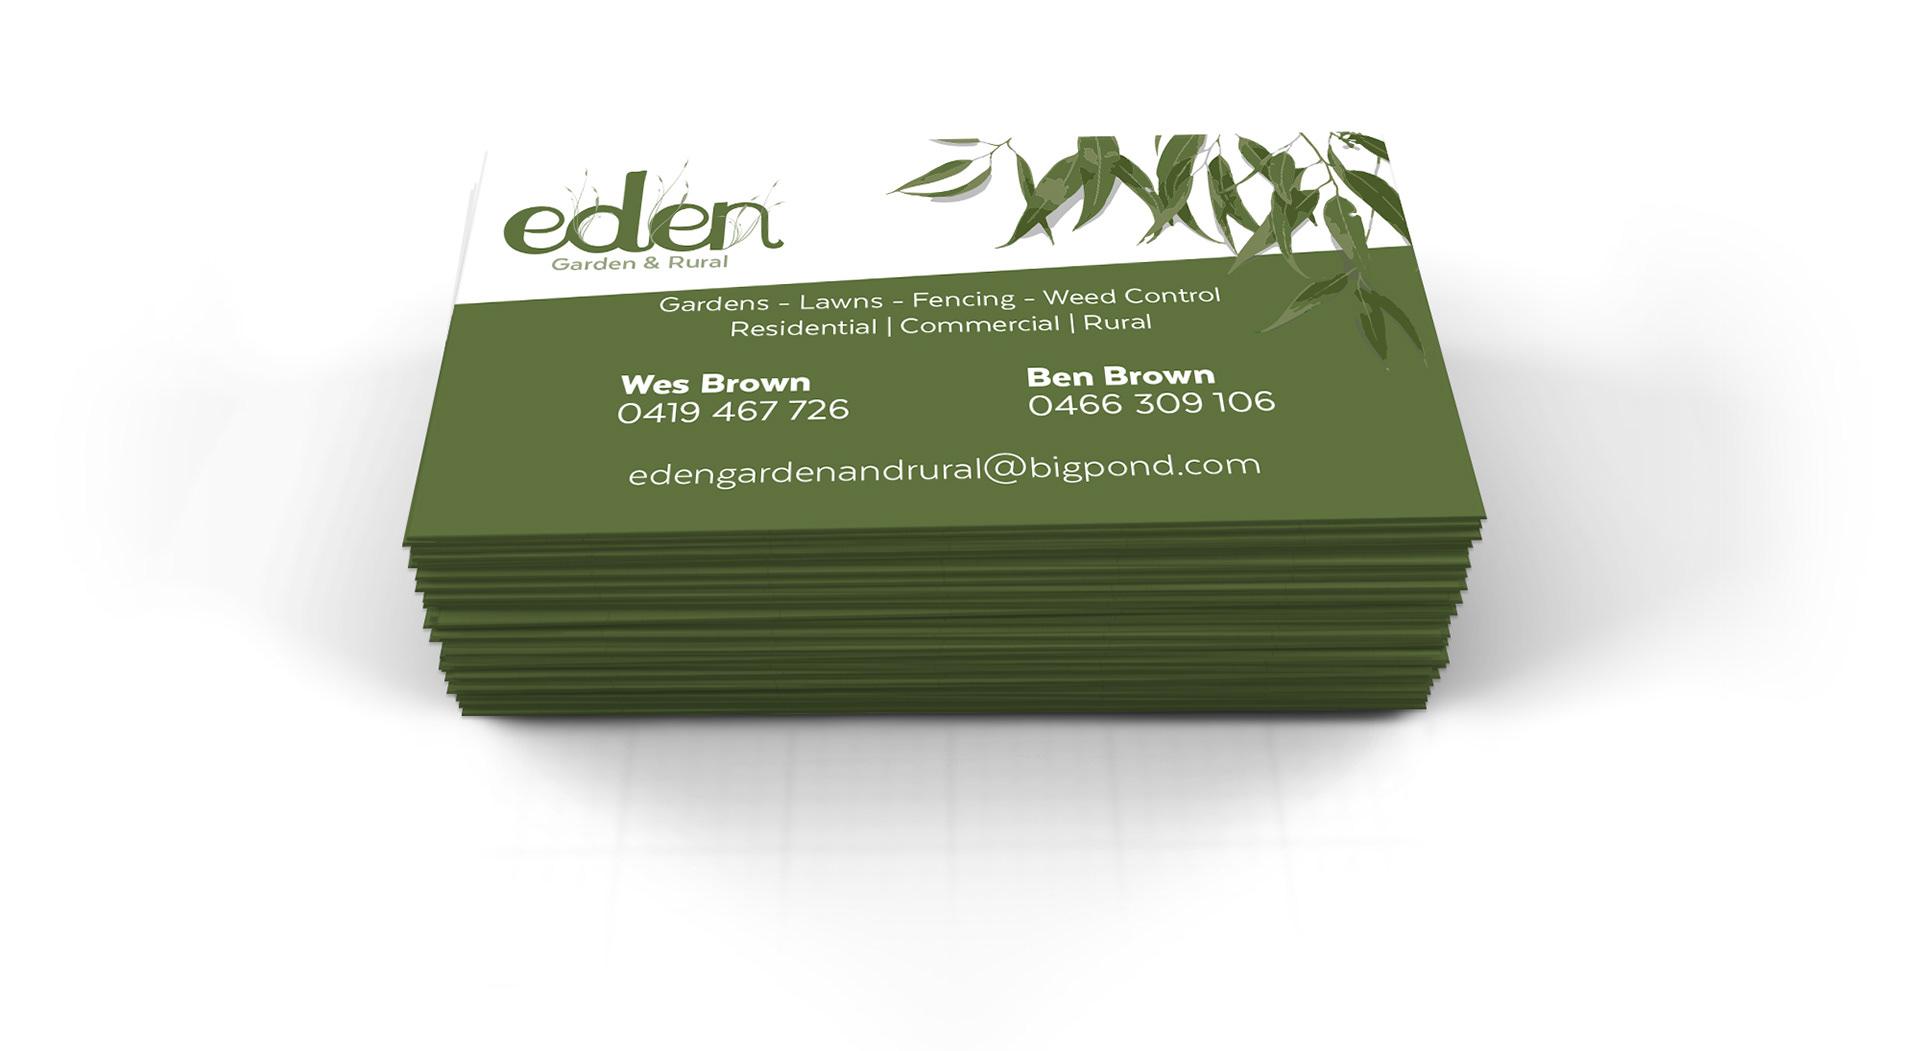 Nathan simpson graphic designer logo business card design for eden garden rural magicingreecefo Image collections